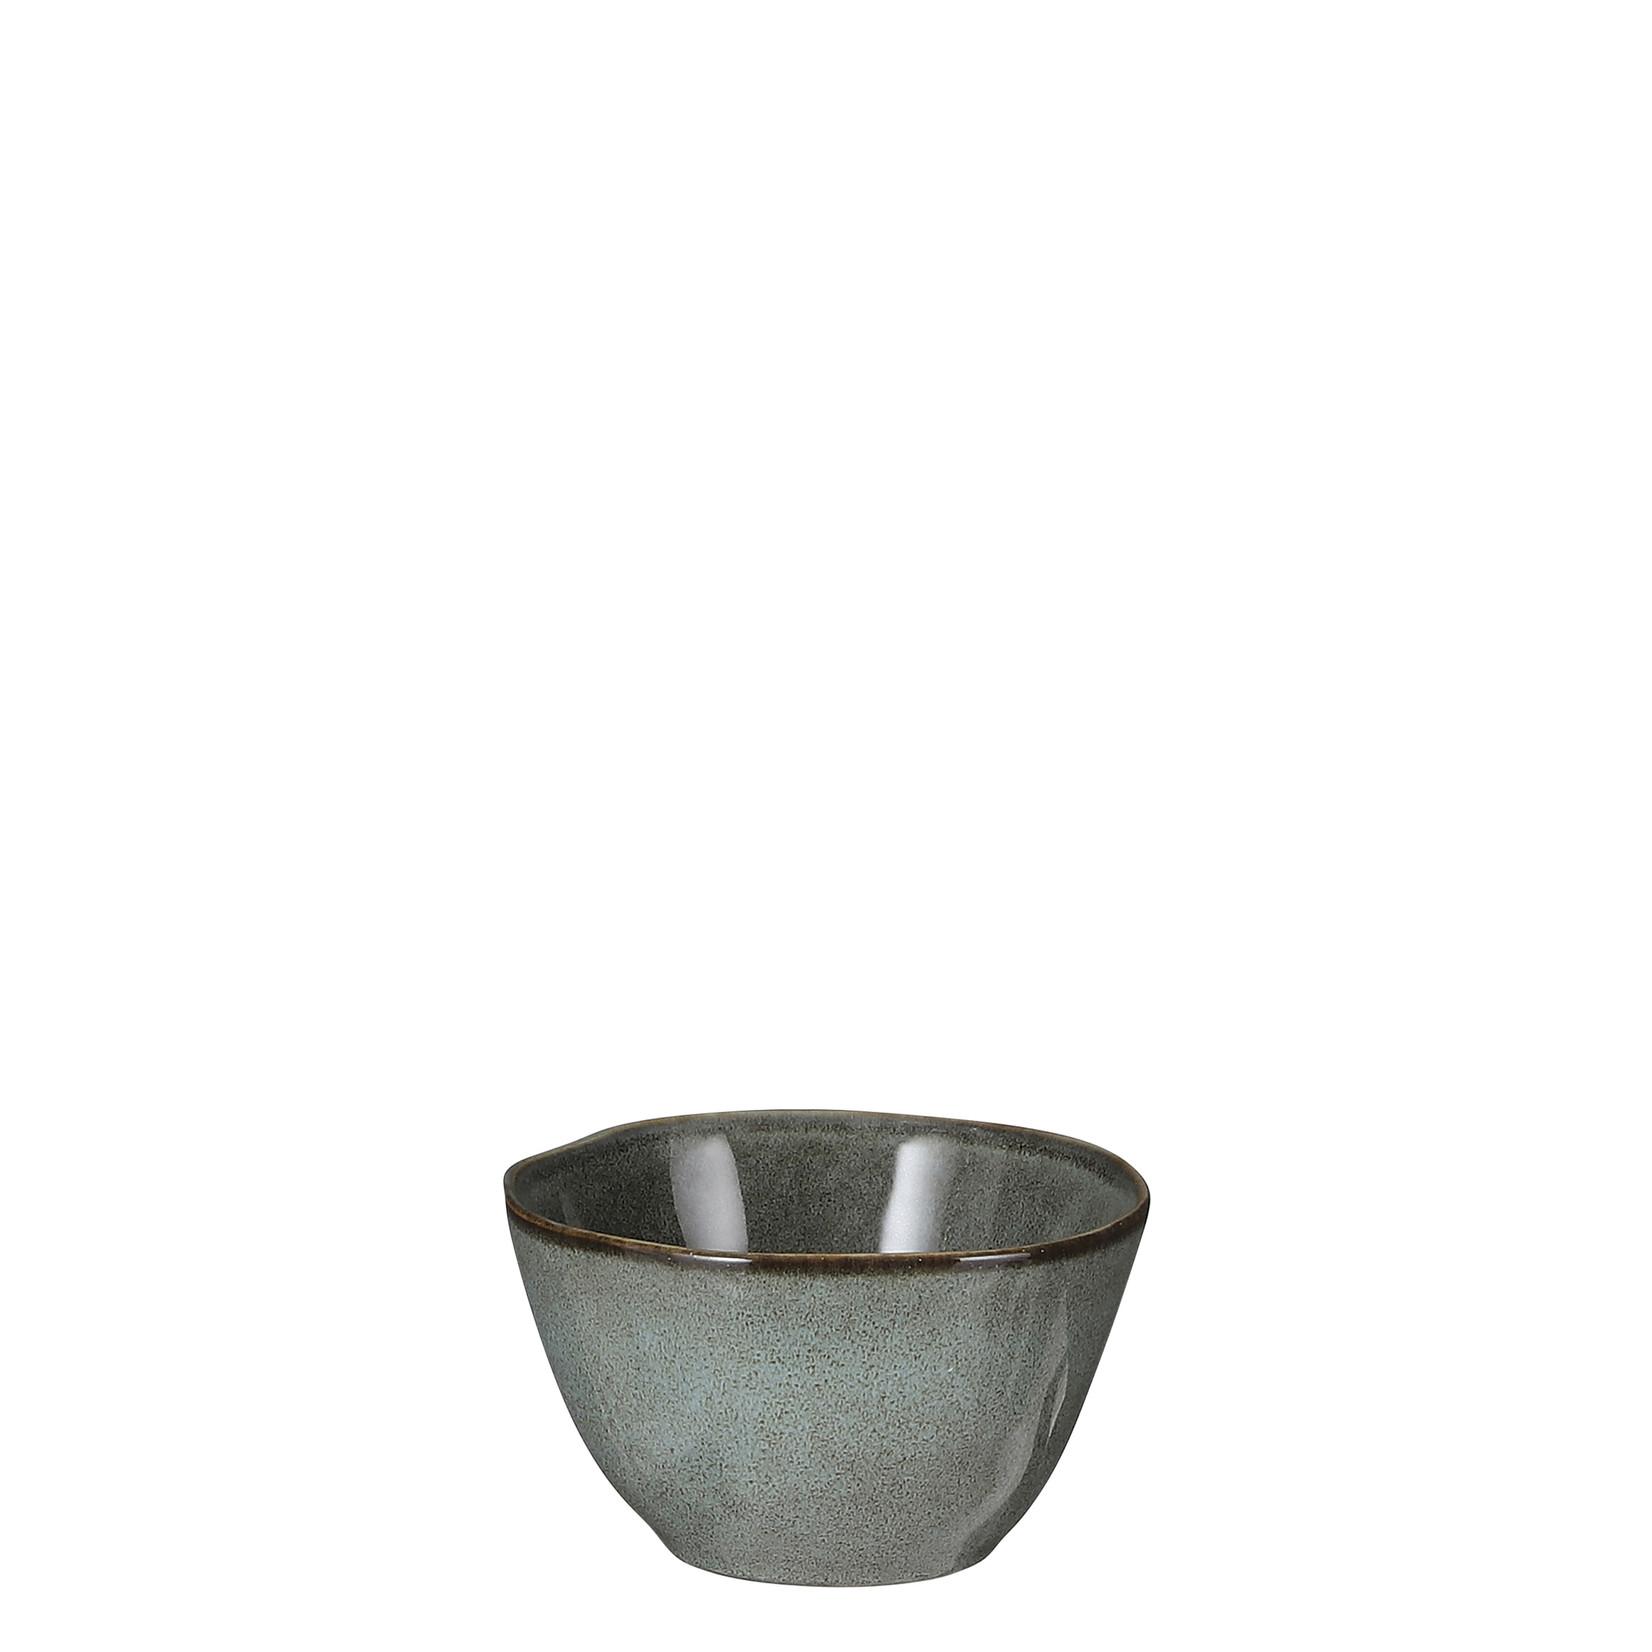 MiCa Tabo bowl green